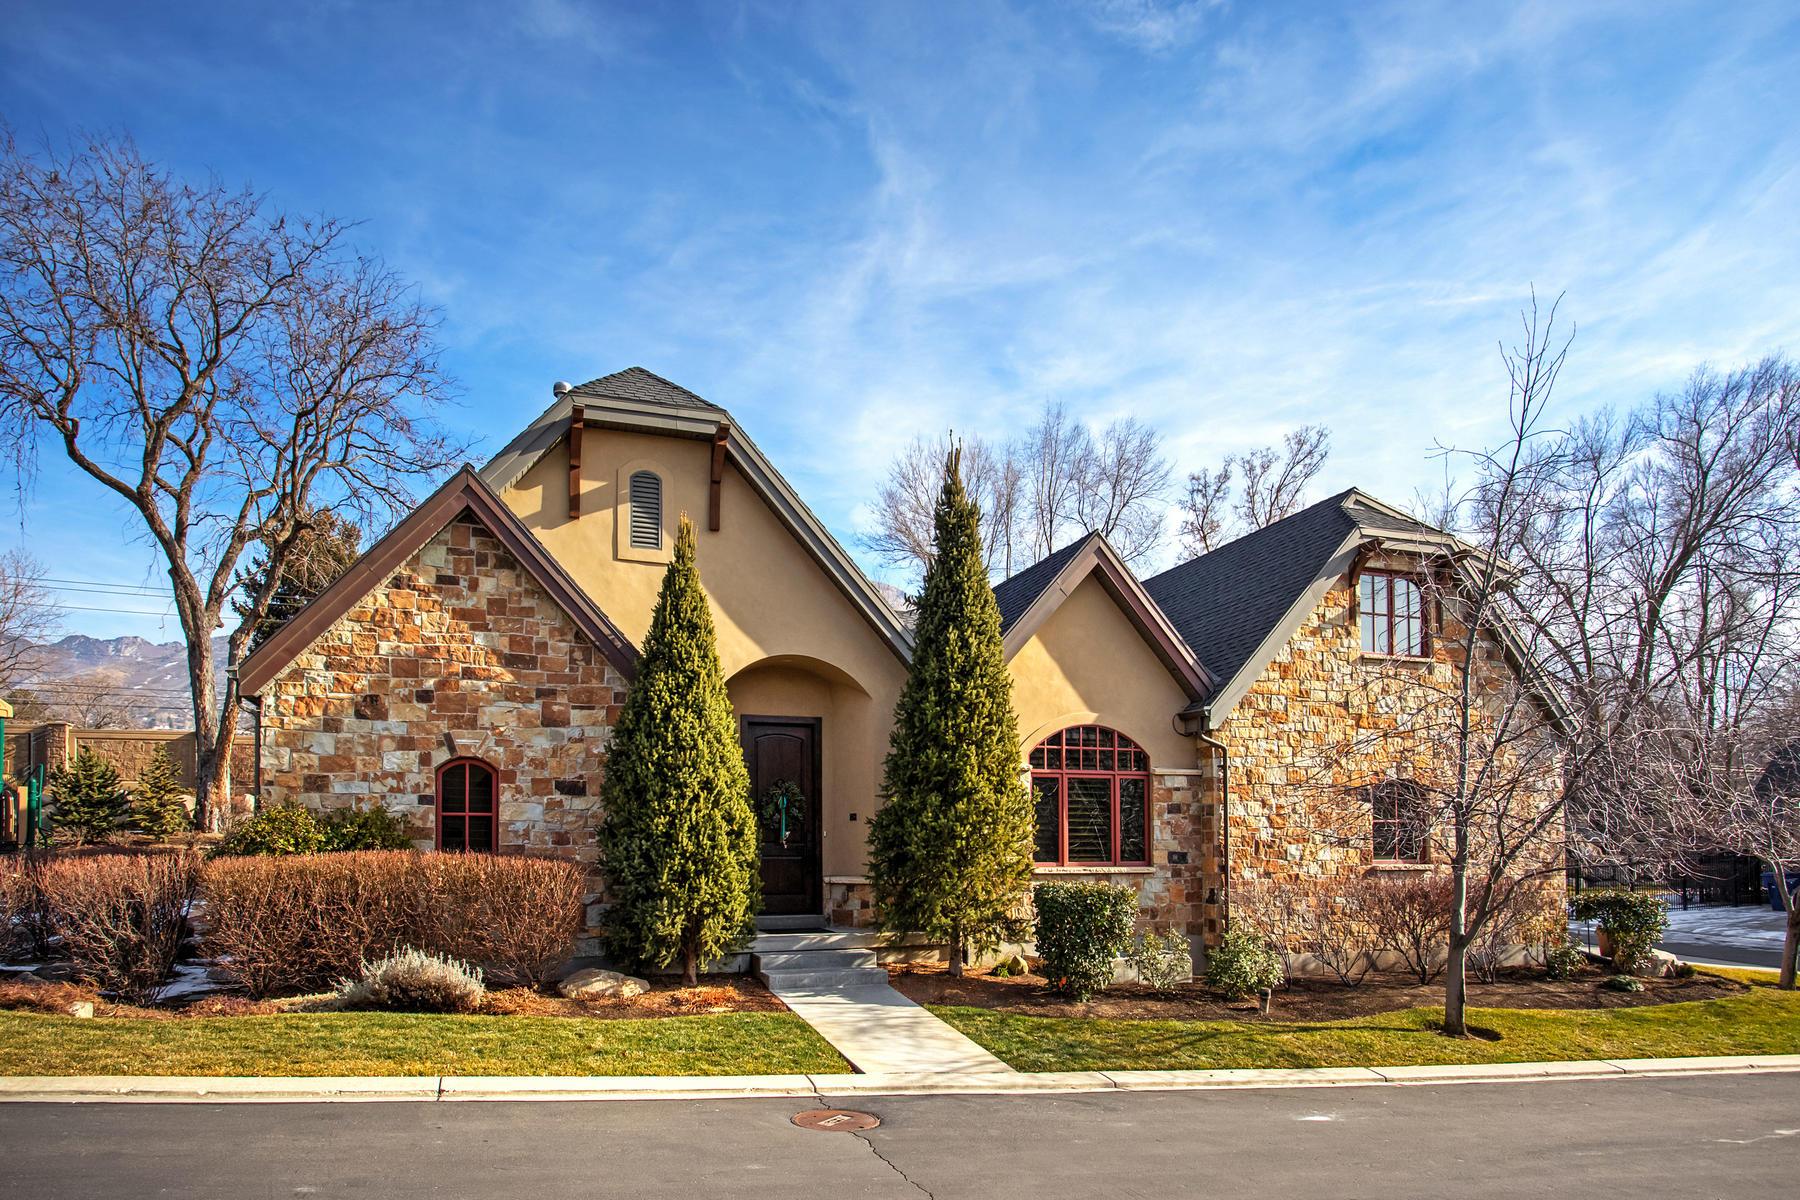 獨棟家庭住宅 為 出售 在 5000 Sq Foot Beauty in Holladay 4949 S Holladay Pines Ct, Holladay, 猶他州, 84117 美國